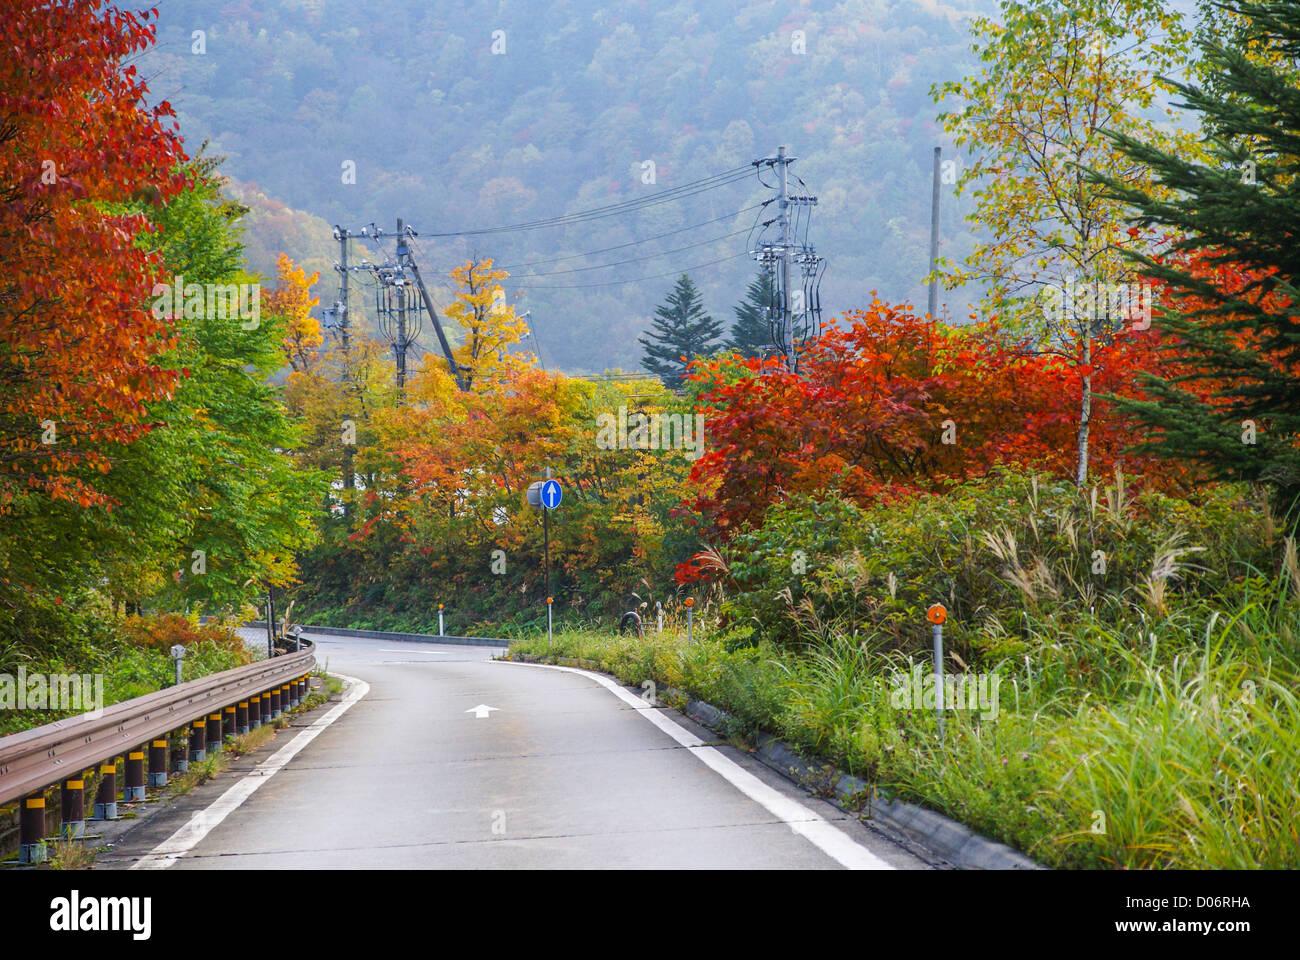 Japan, Honshu Island, Kanagawa Prefecture, Fuji Hakone National Park, - Stock Image